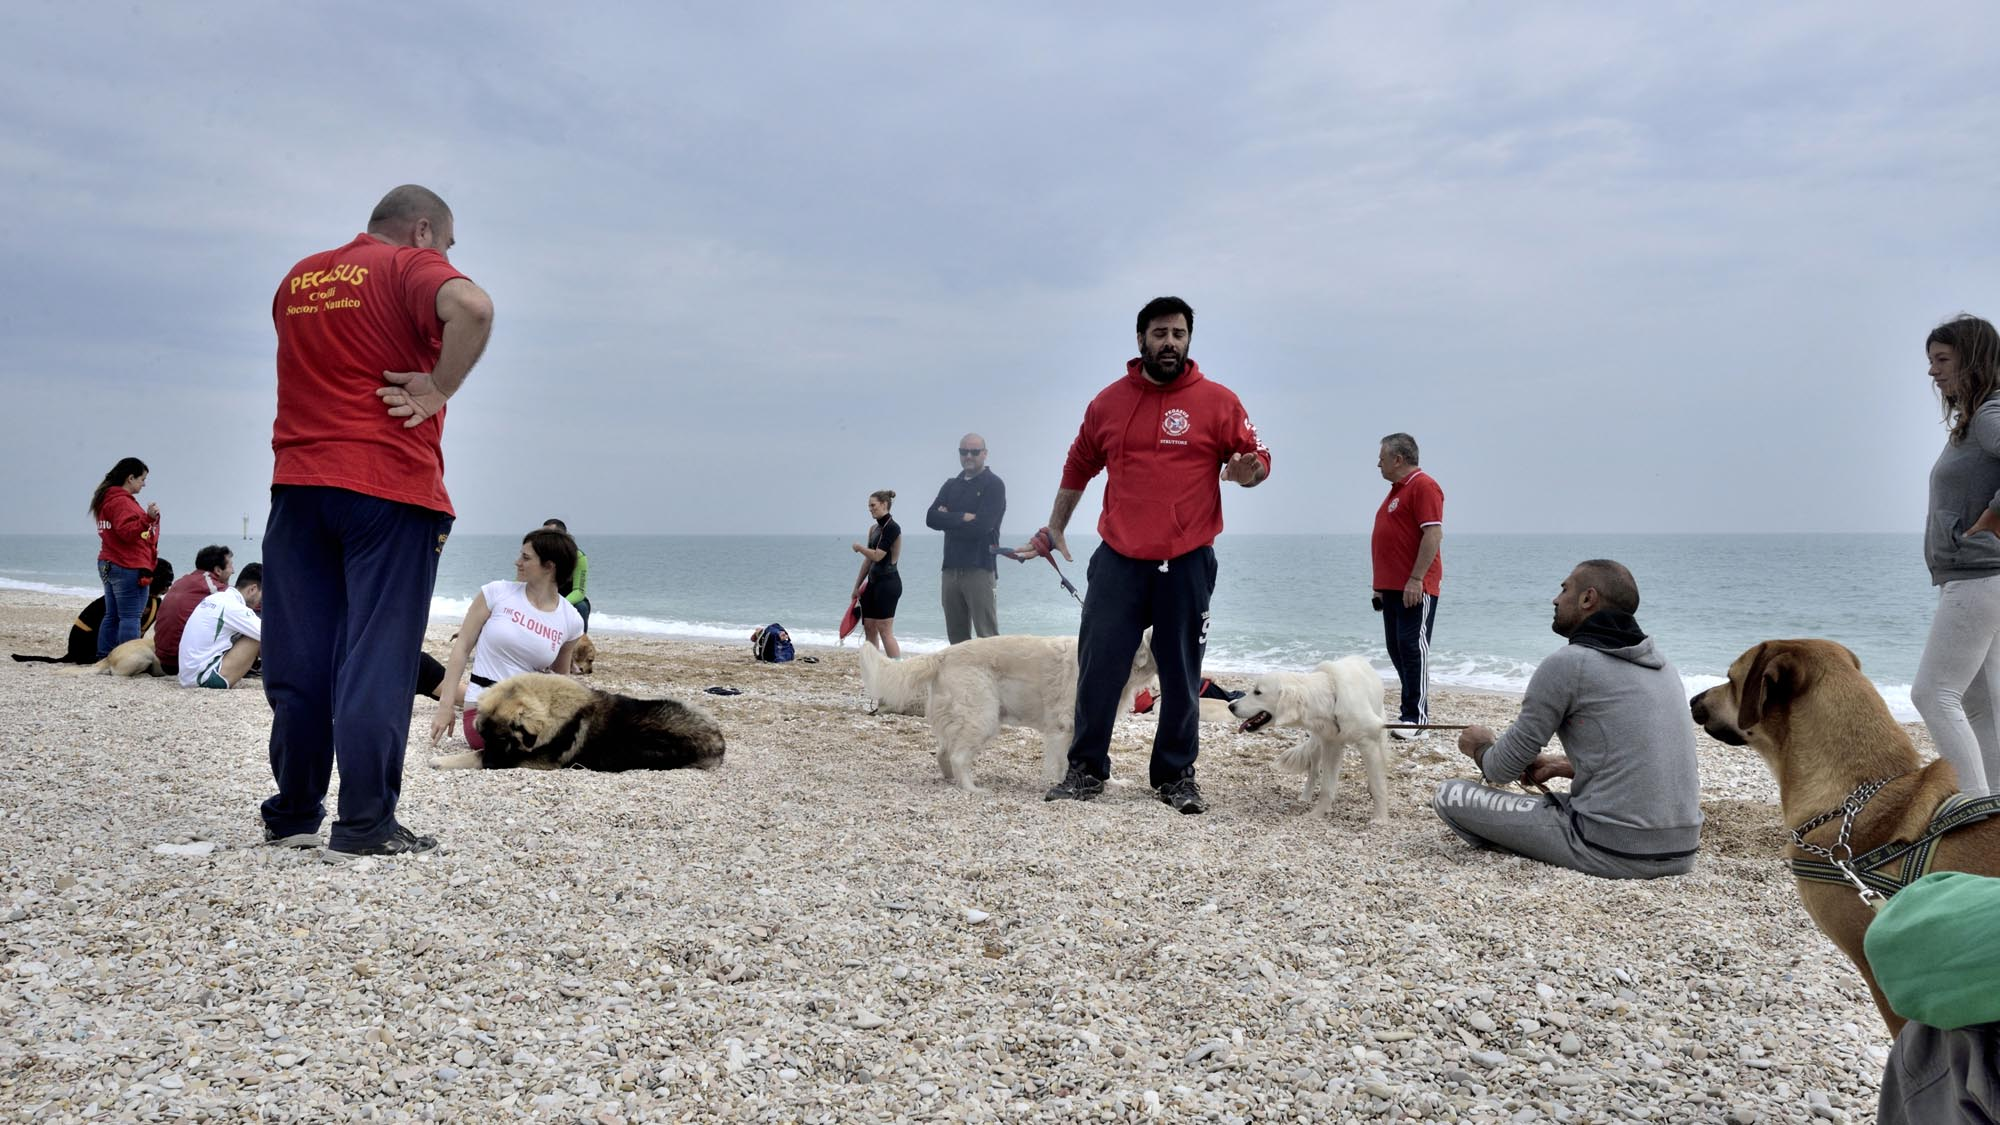 0106 addestramento cani soccorso cinofilo - Soccorso cinofilo Pegasus